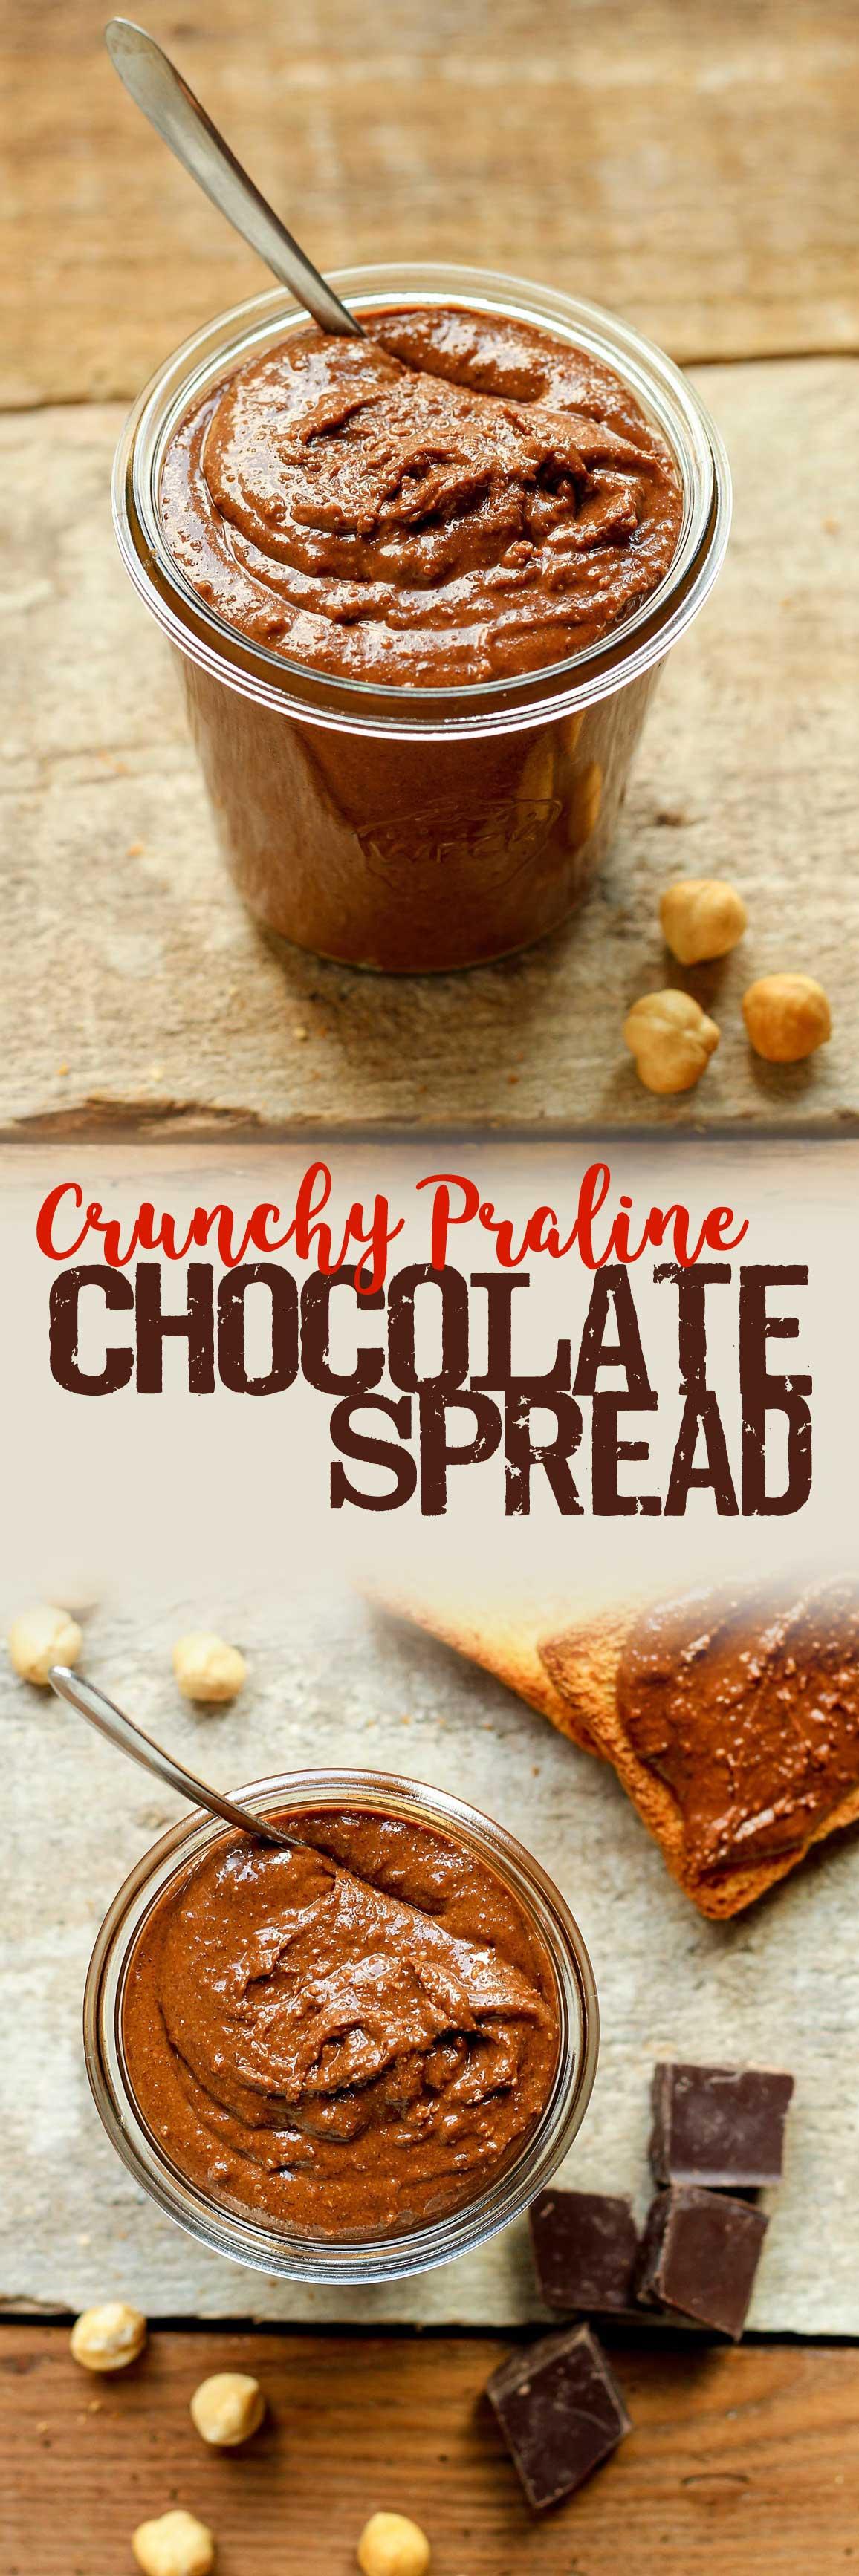 Crunchy Praline Chocolate Spread